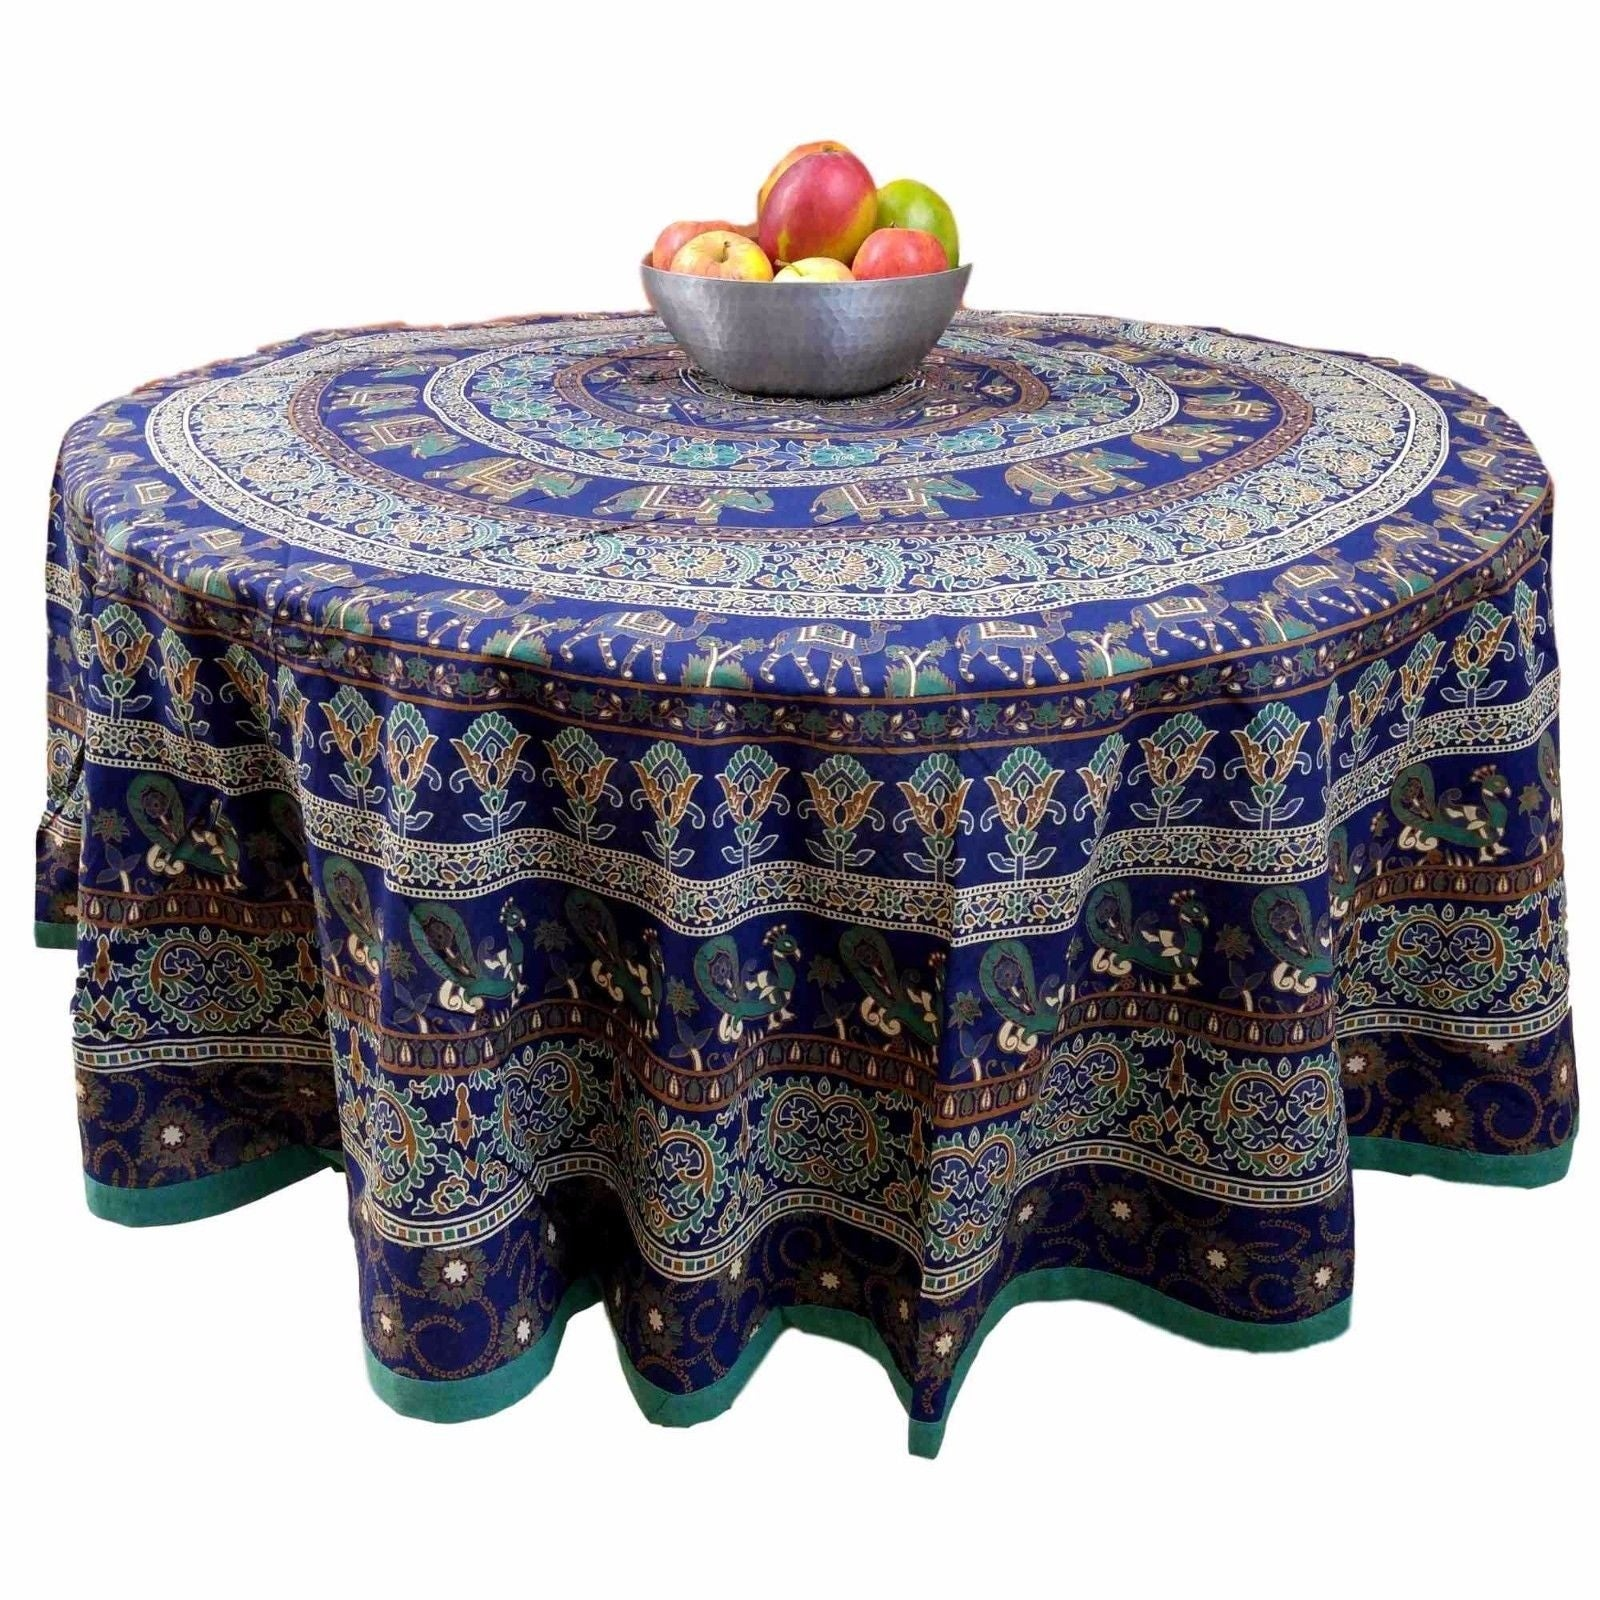 "Handmade 100% Cotton Elephant Mandala Floral 81"" Round Tablecloth Blue - Thumbnail 0"